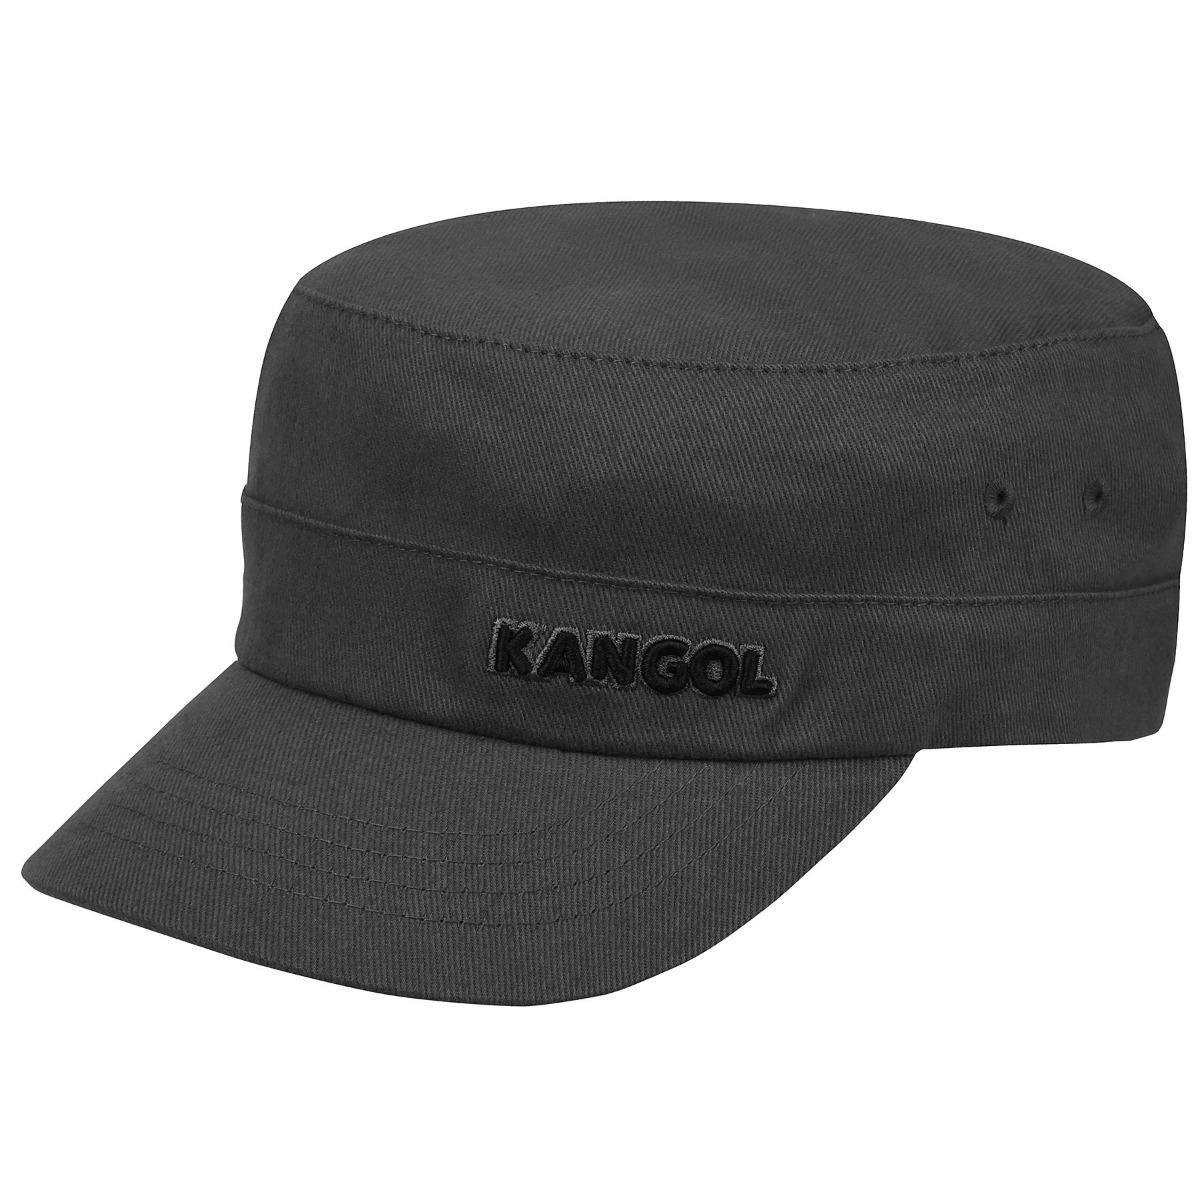 Kangol Cotton Twill Army Cap in Grey